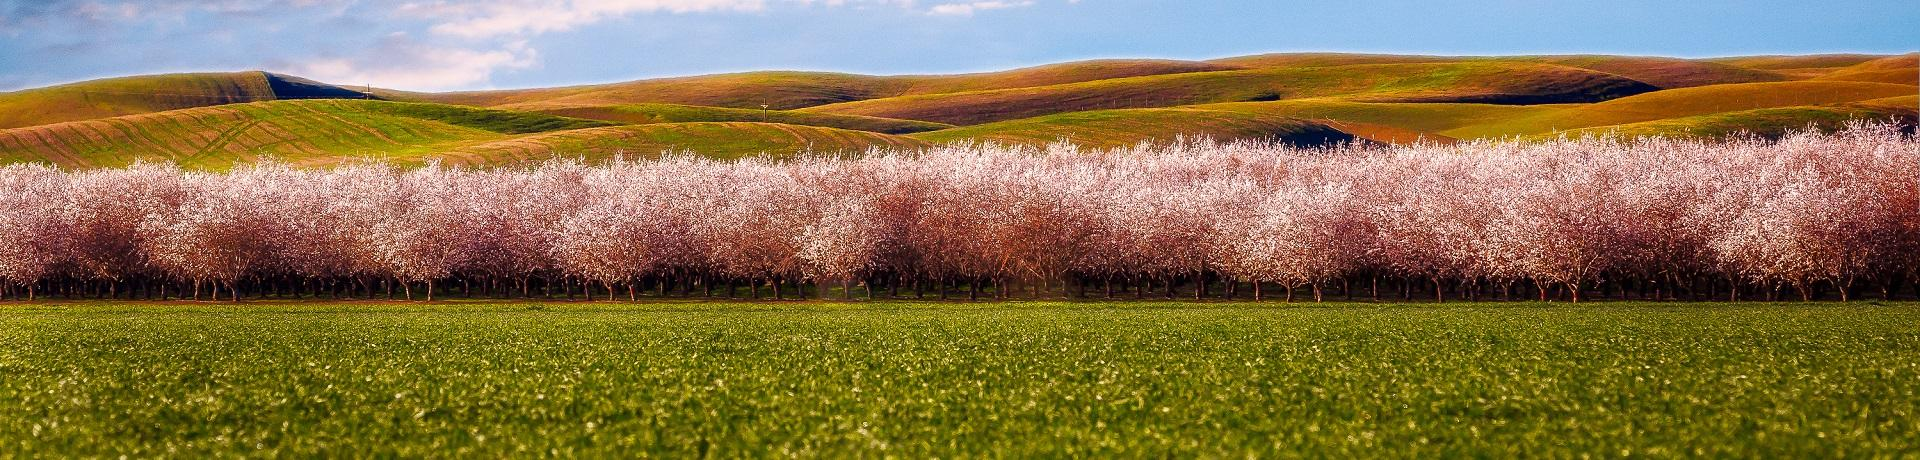 USA: Kalifornien - Mandelblüte - Emotion